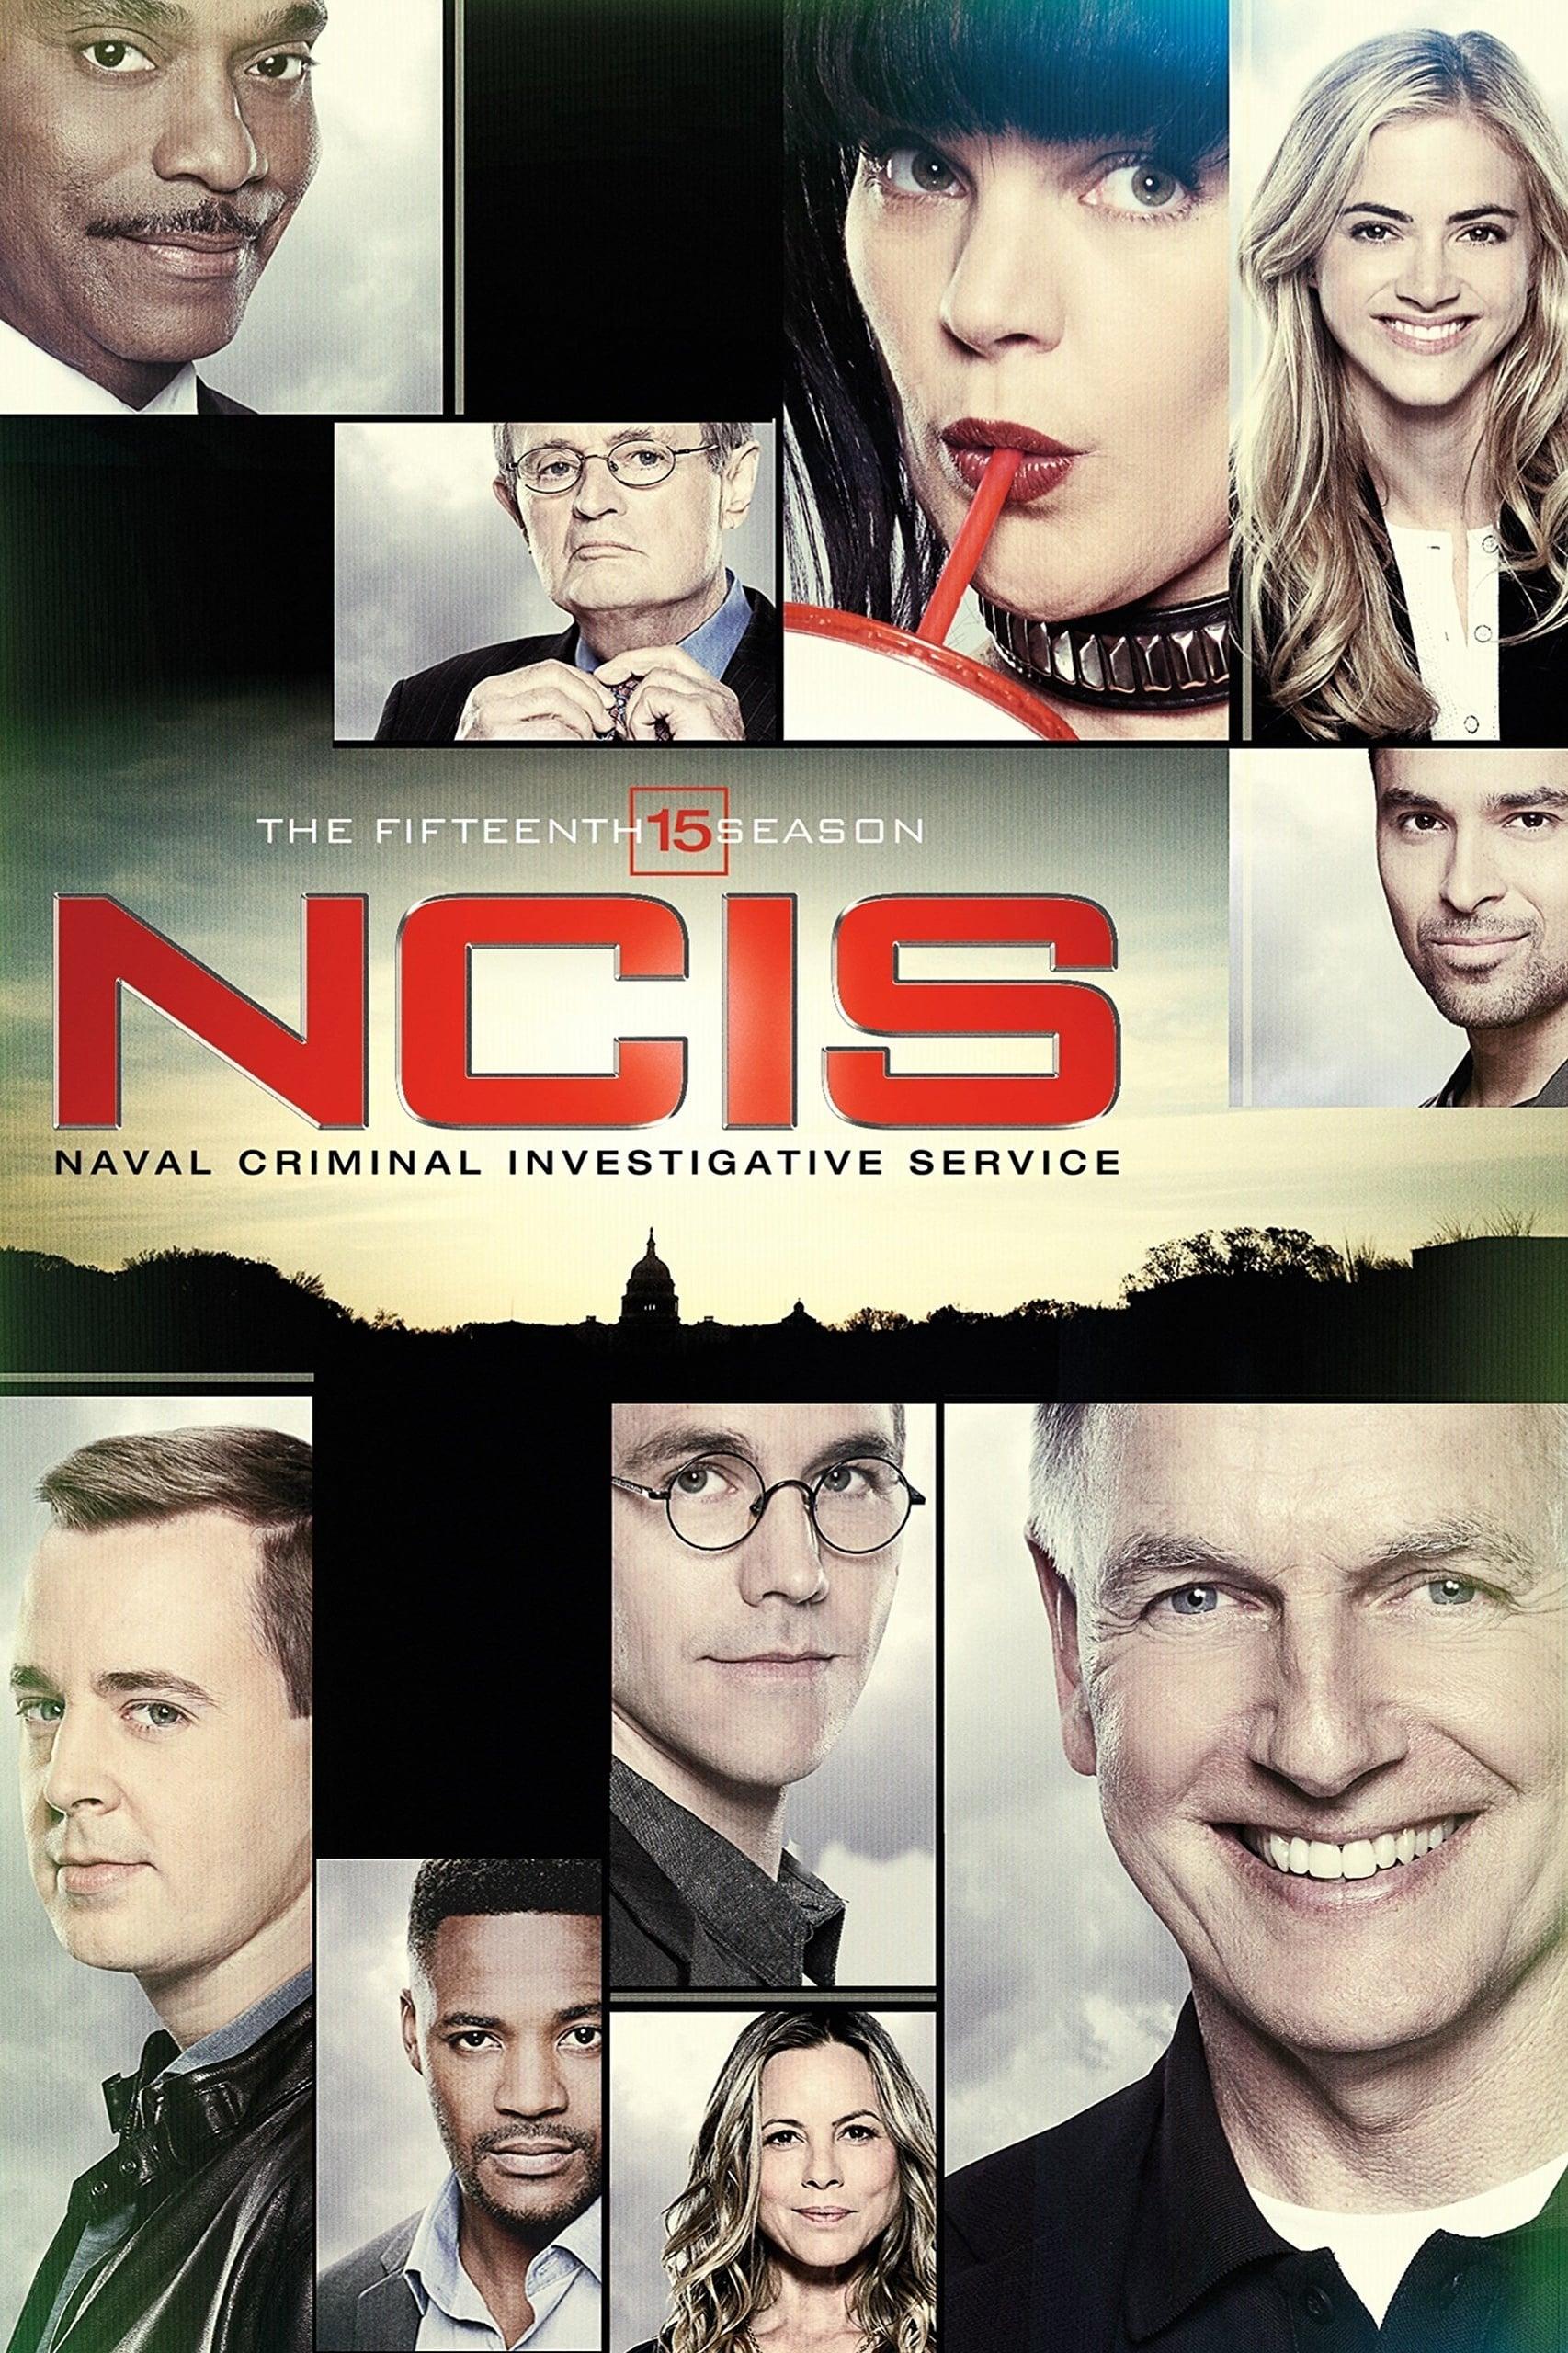 NCIS Season 15